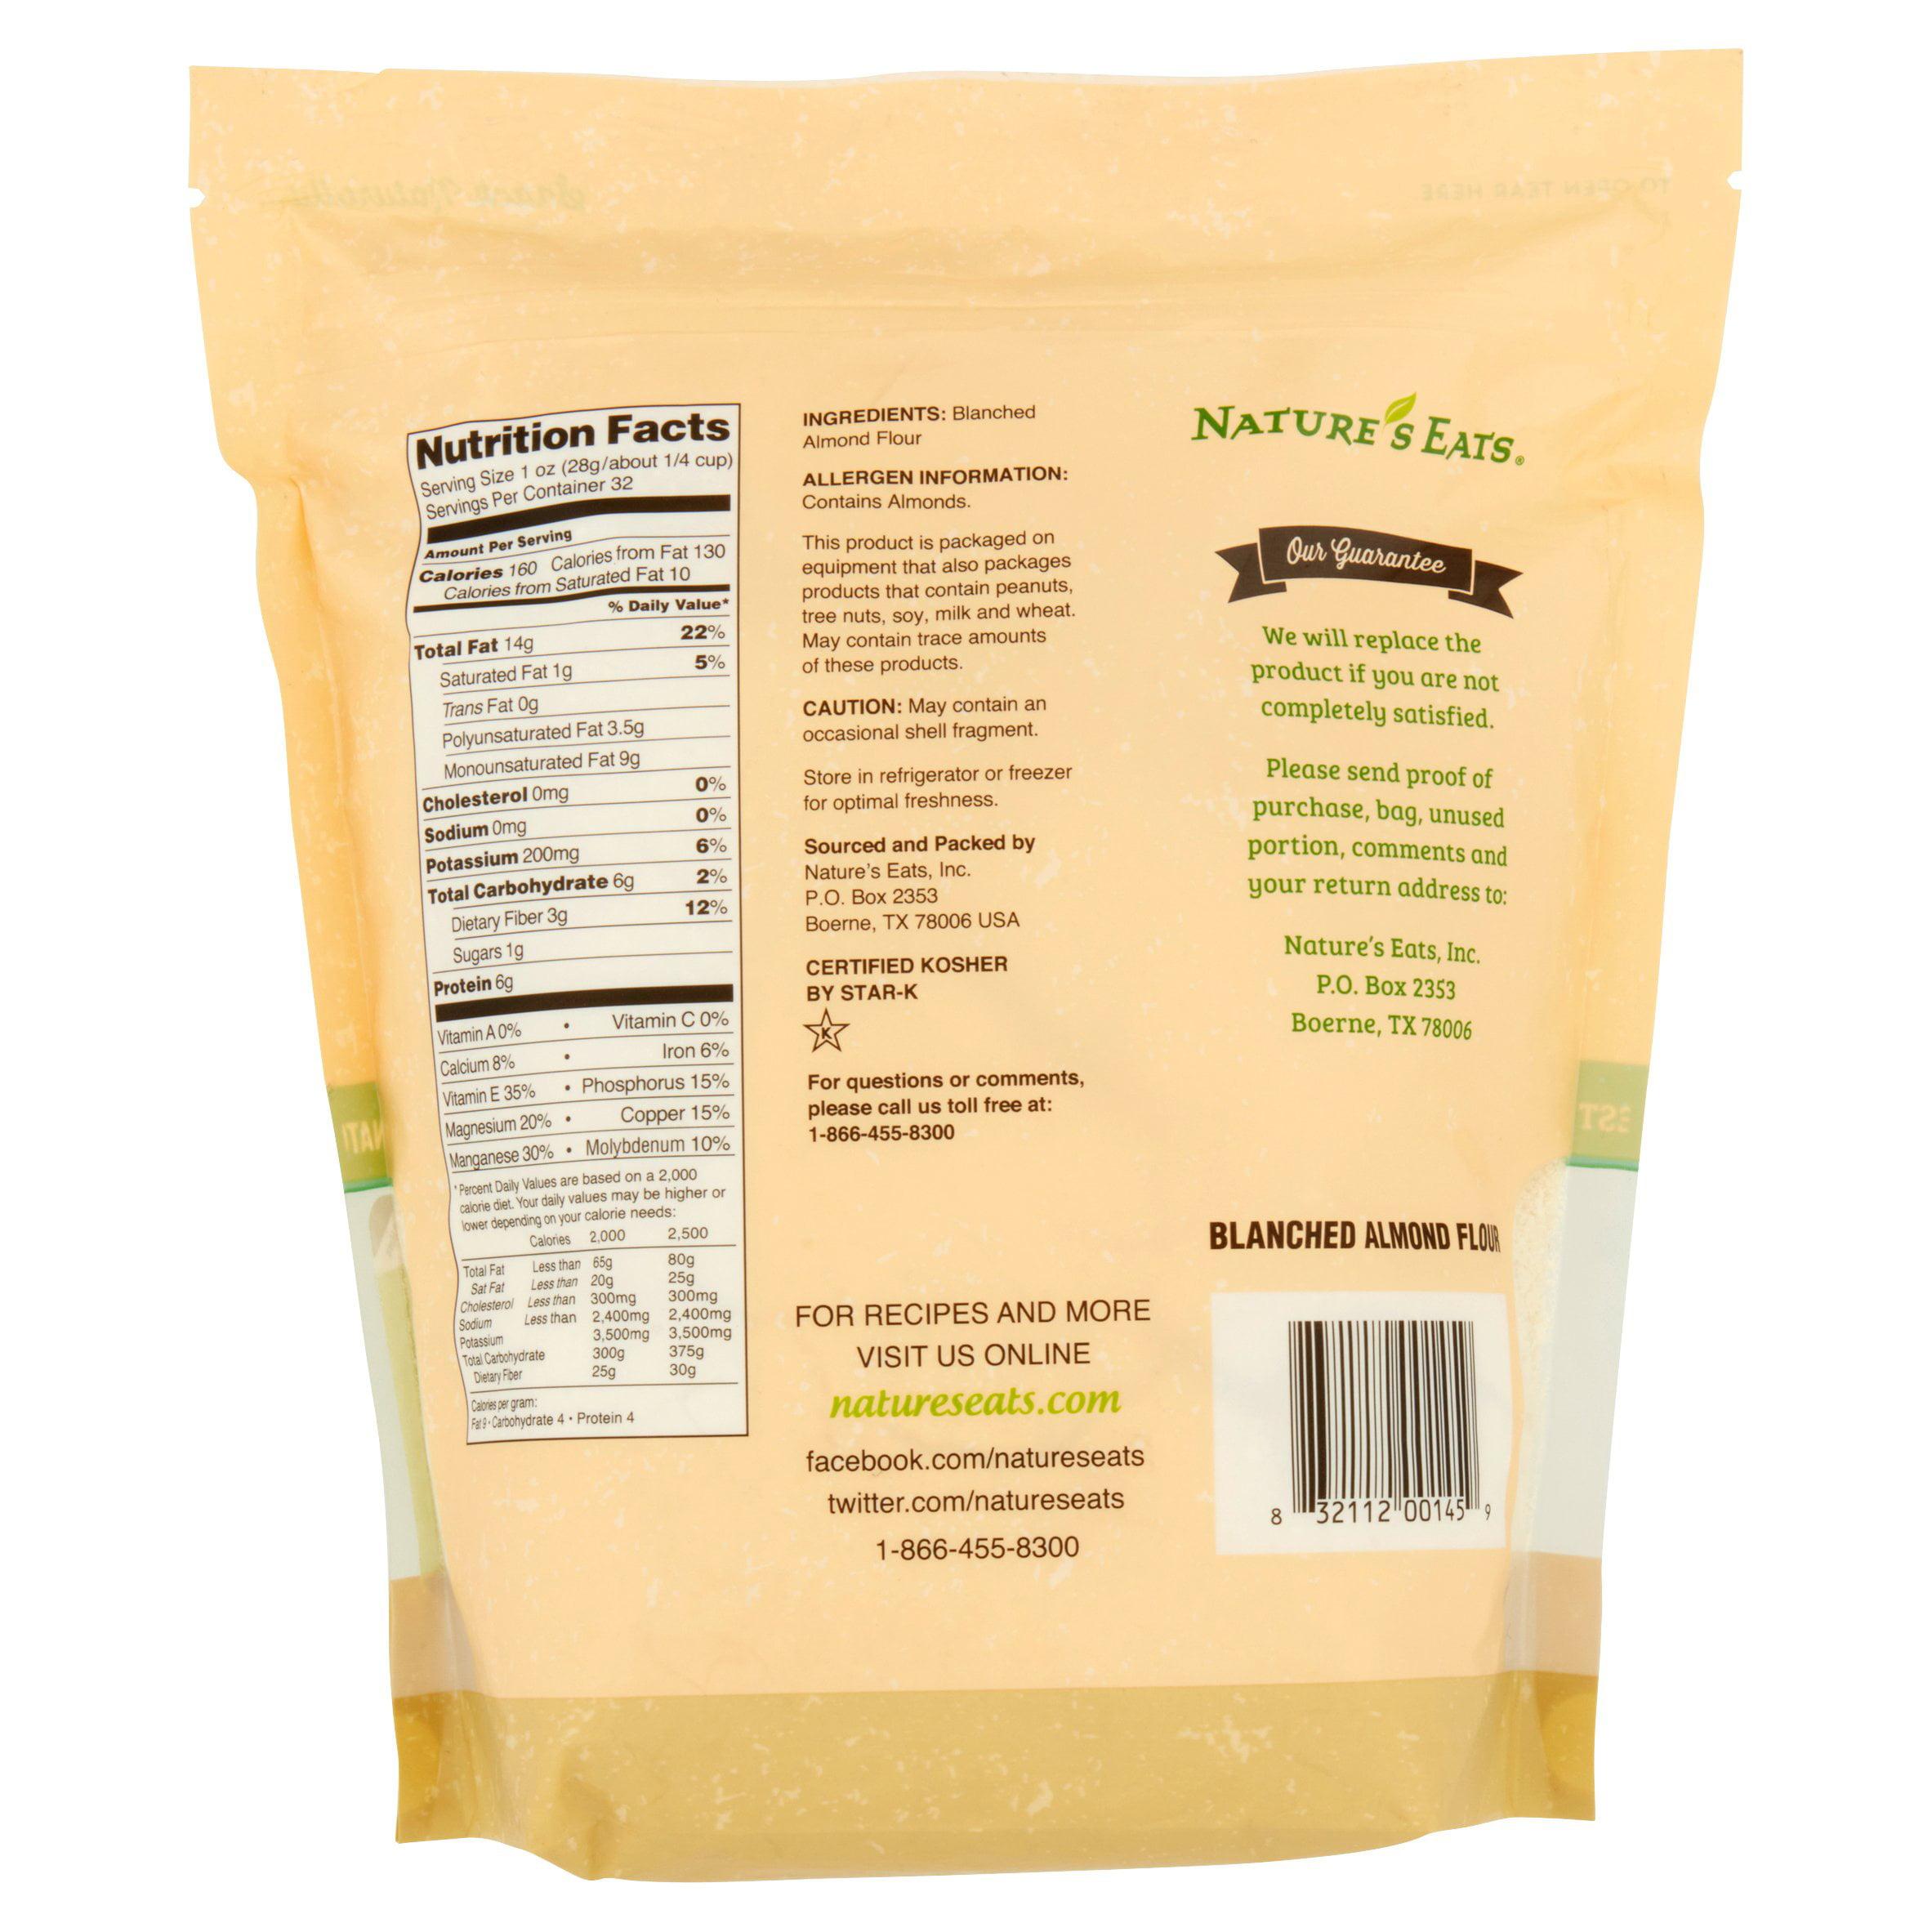 Nature's Eats Blanched Almond Flour, 32 Oz